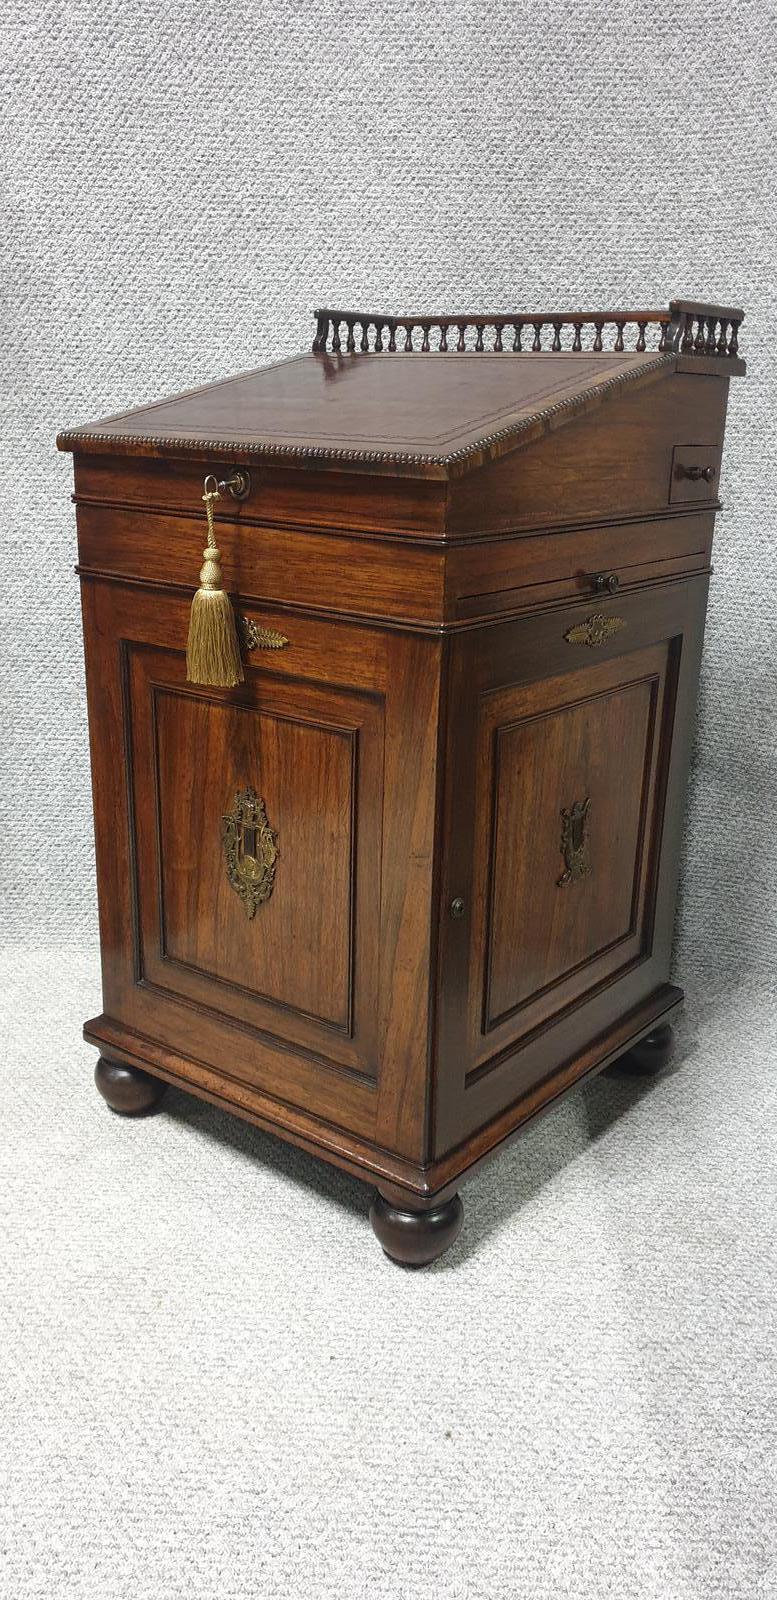 Top Quality Regency Rosewood Davenport Desk (1 of 1)